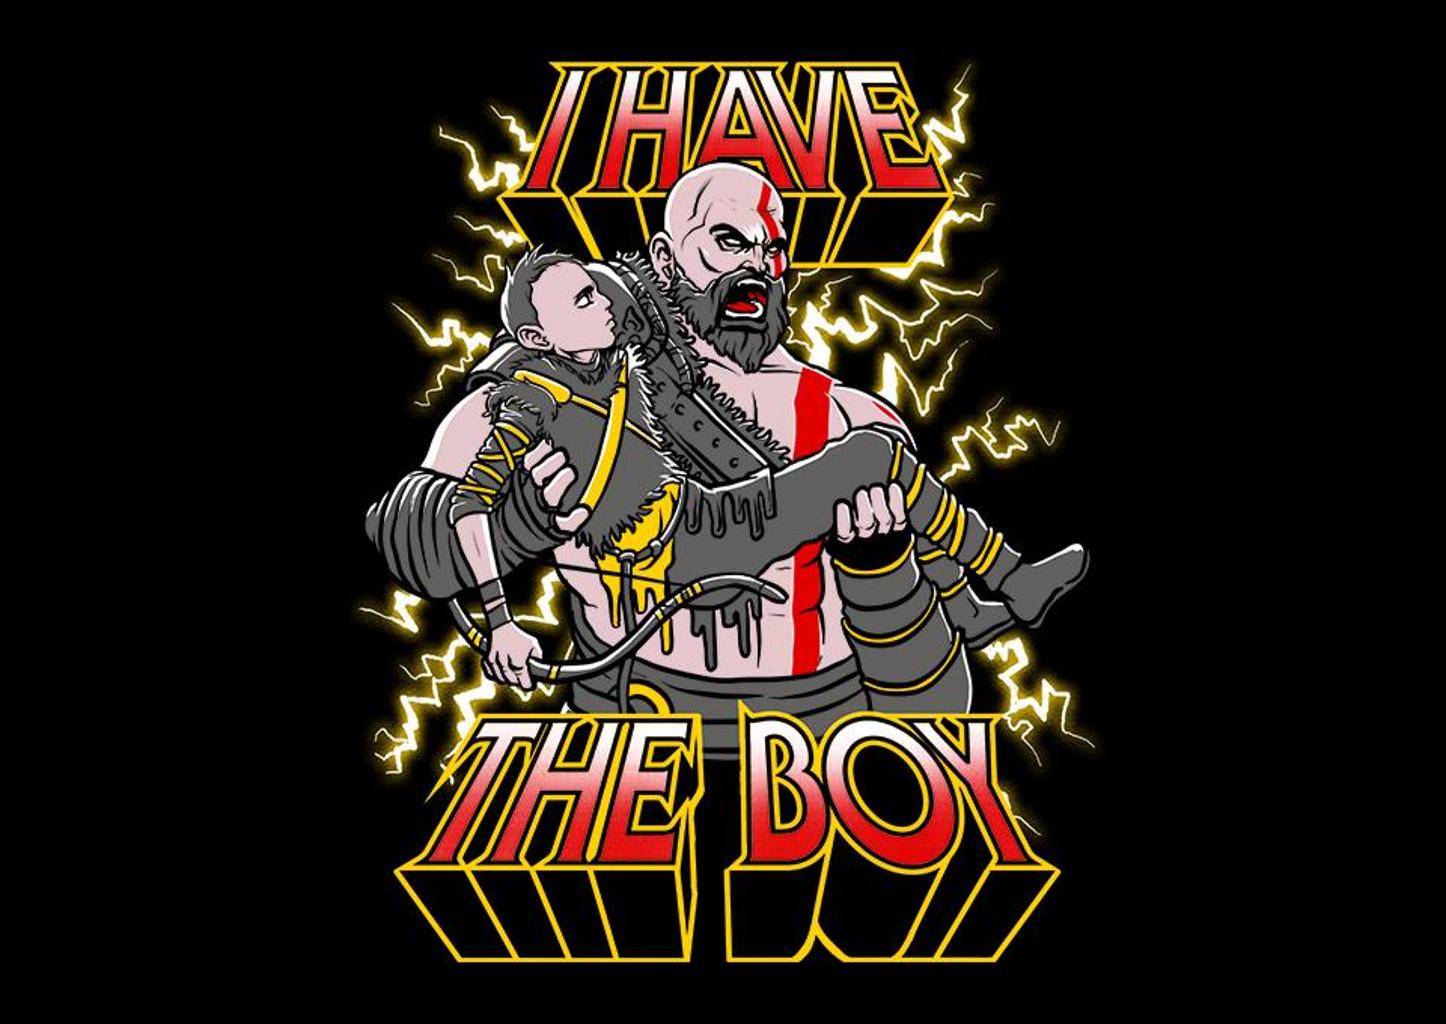 TeeFury: I Have The Boy